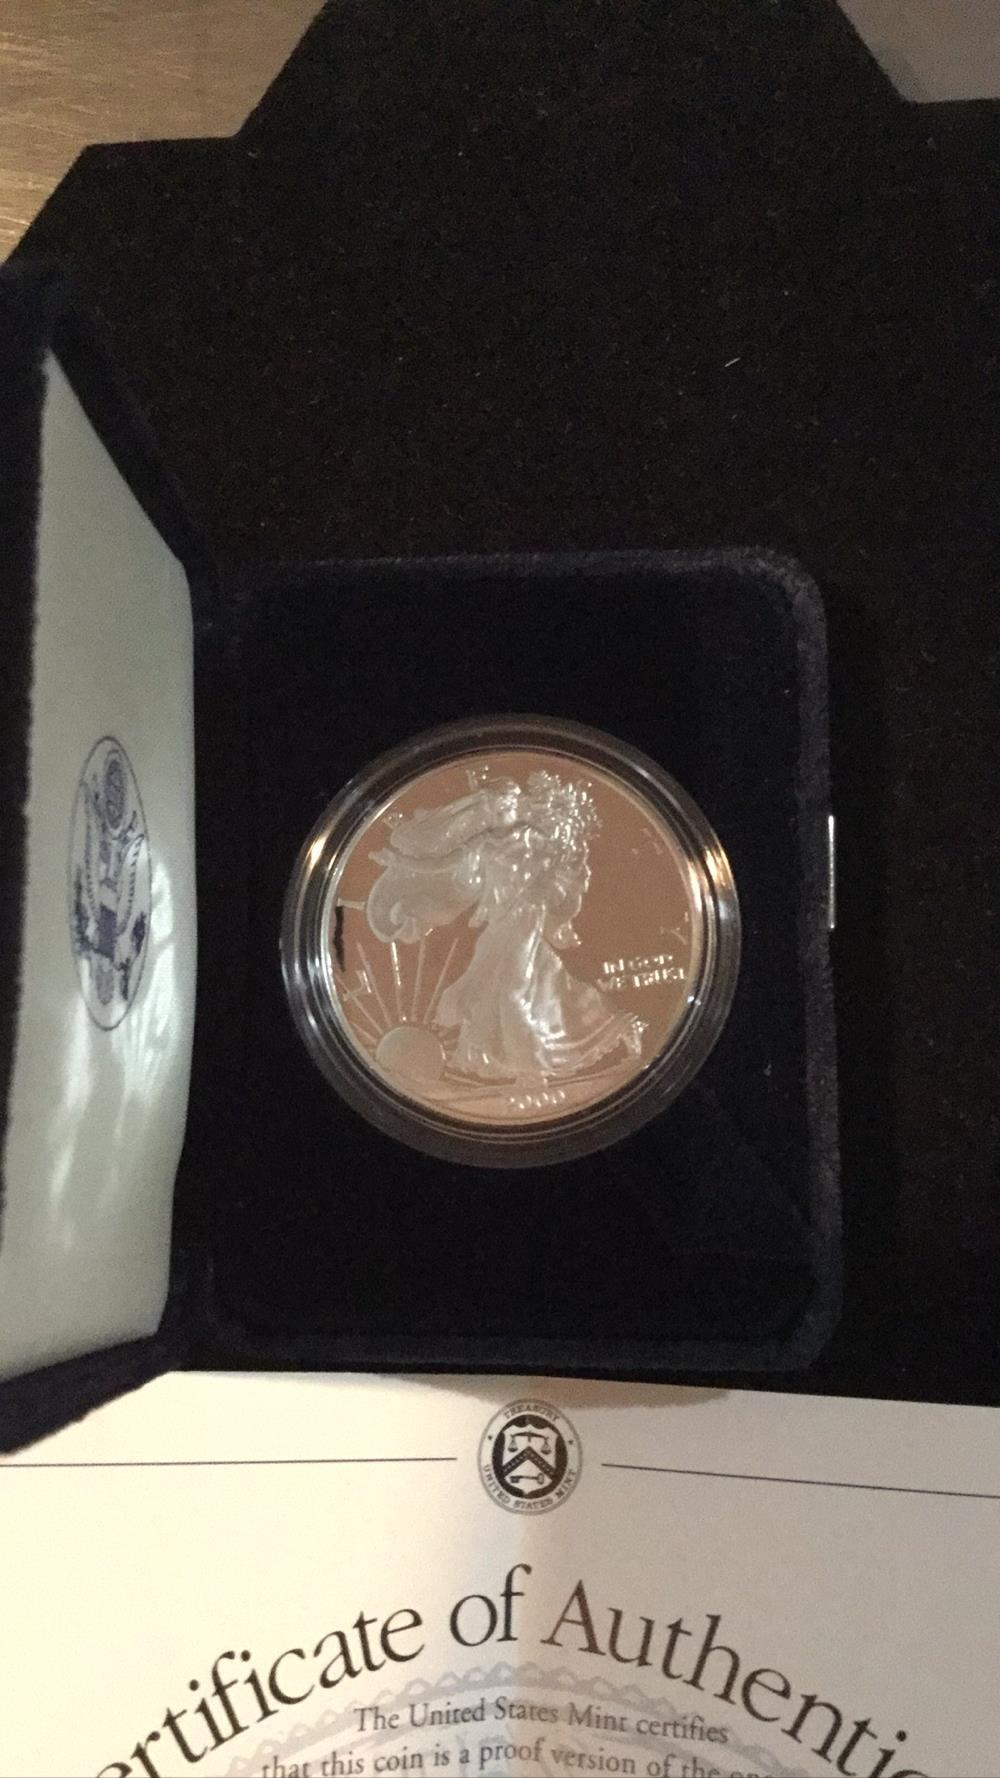 Lot 168: American eagle 1 ounce proof silver bullion coin